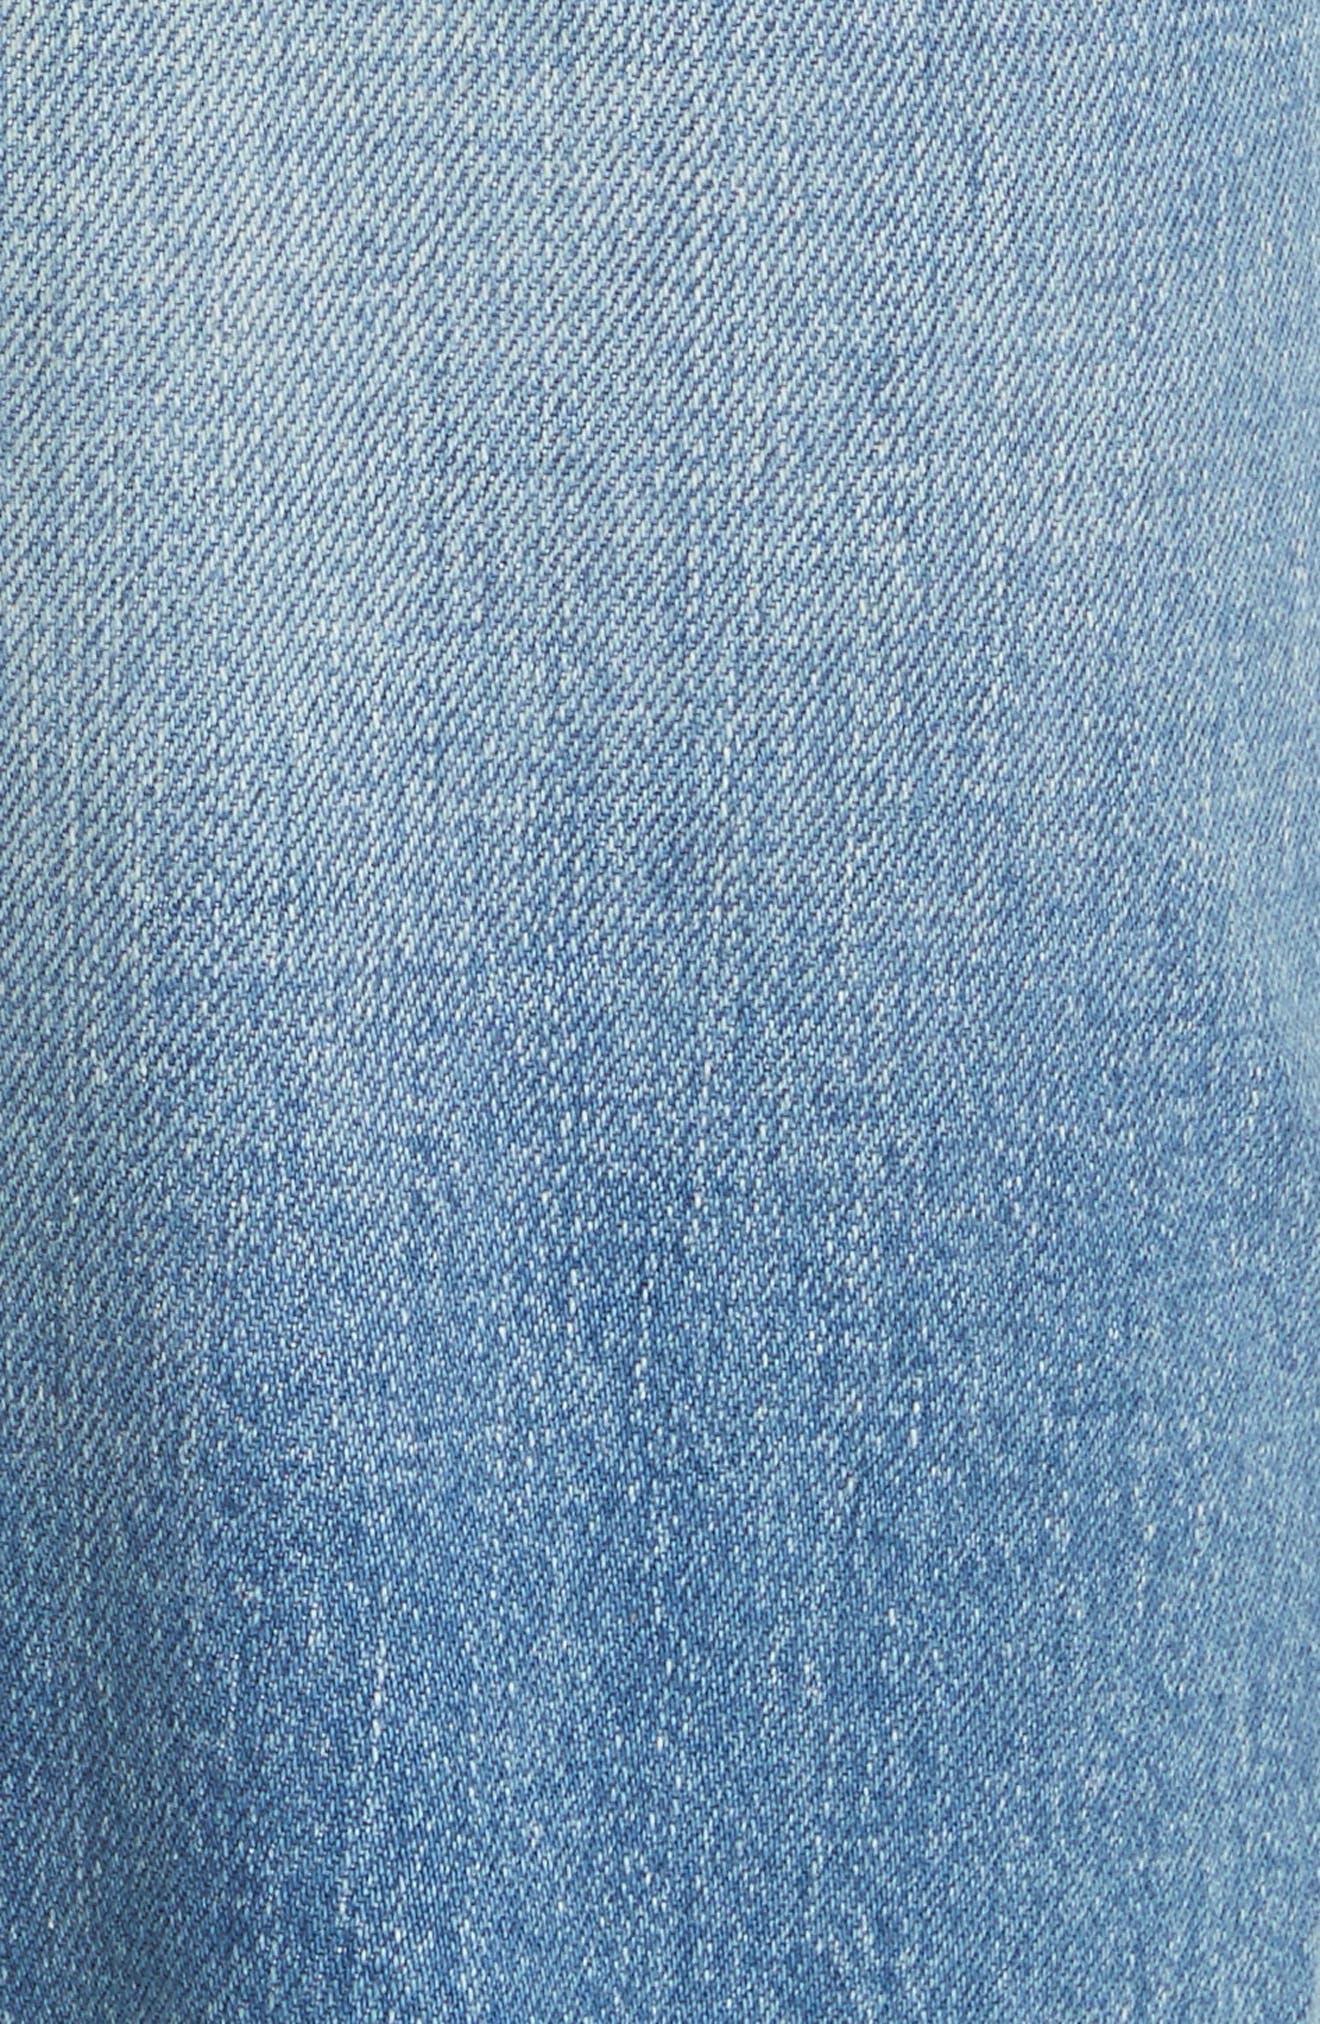 Kiara High Waist Ankle Boyfriend Jeans,                             Alternate thumbnail 6, color,                             464